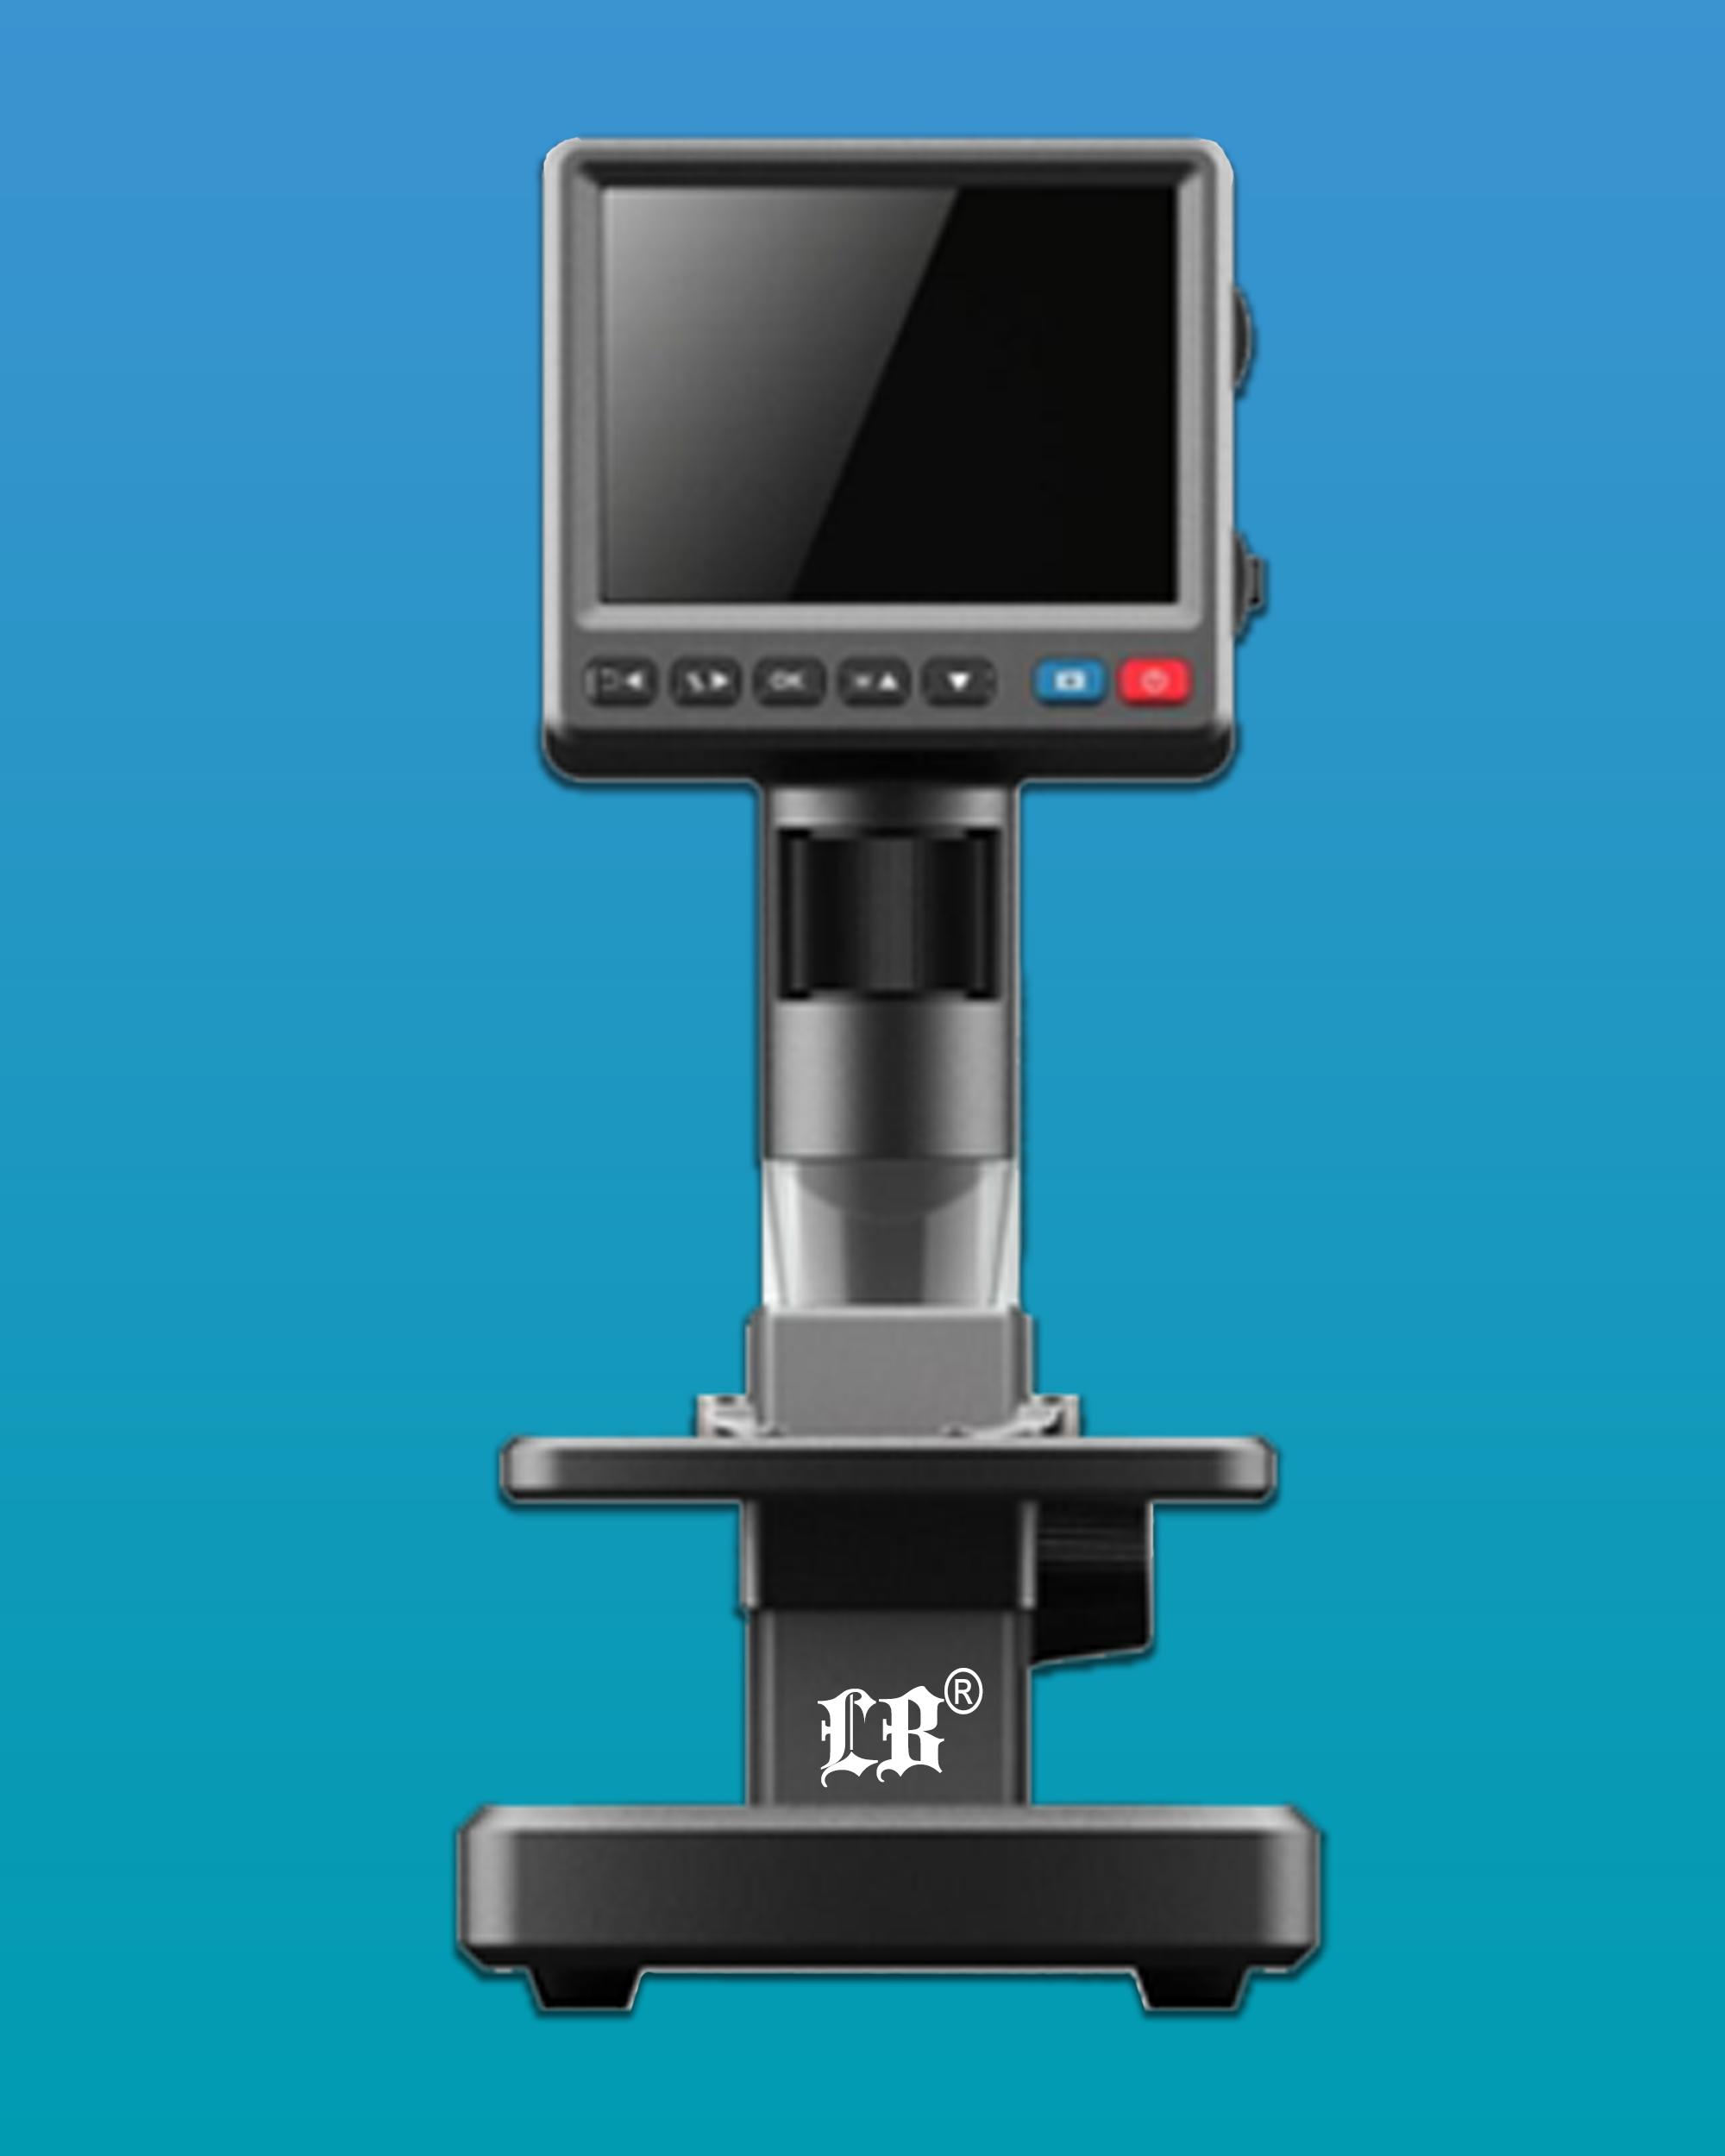 [LB-126] LCD USB Digital Microscope